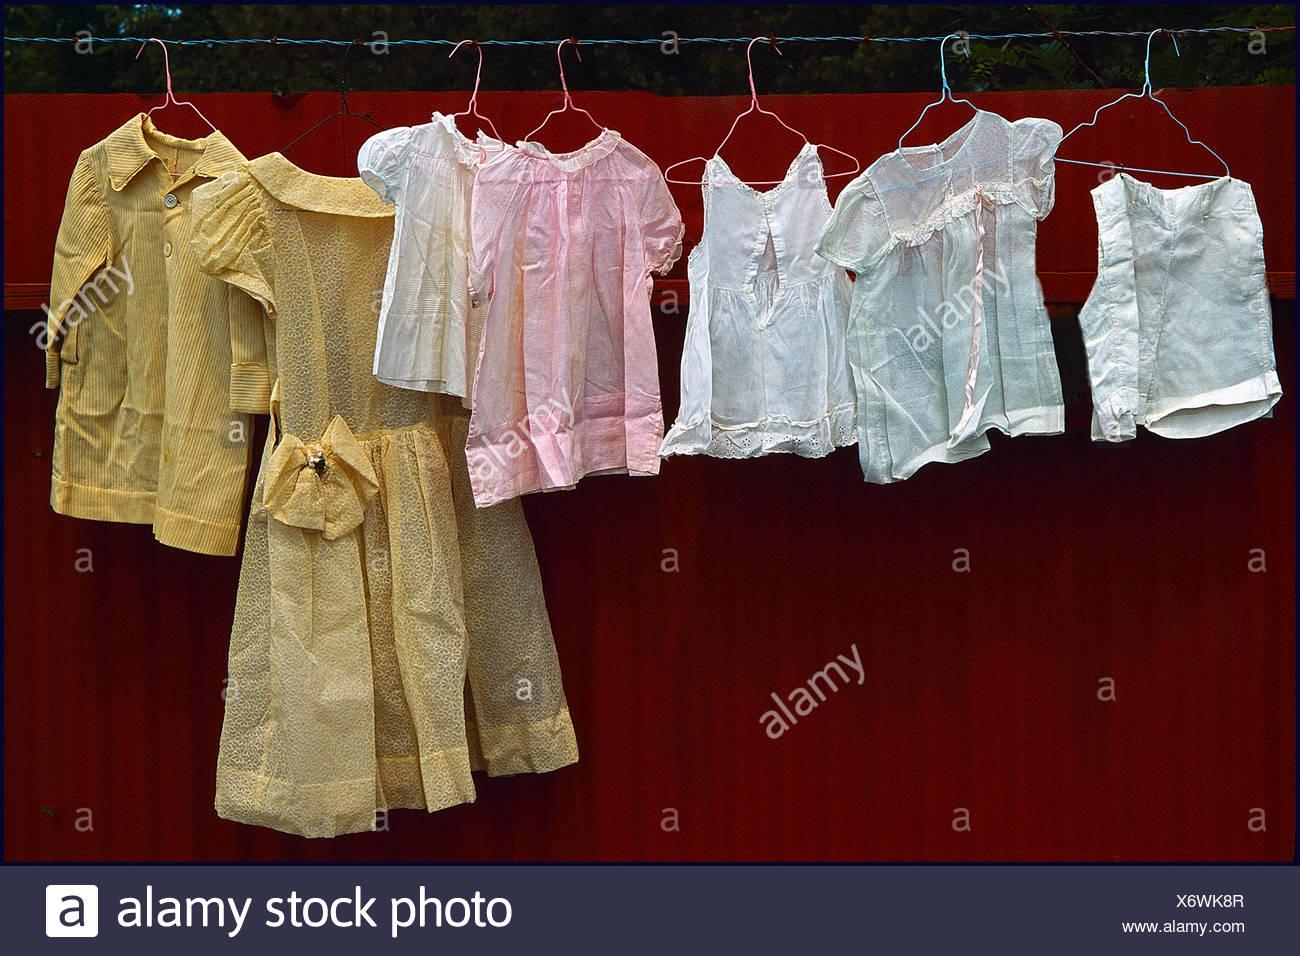 Ropa de niños Imagen De Stock